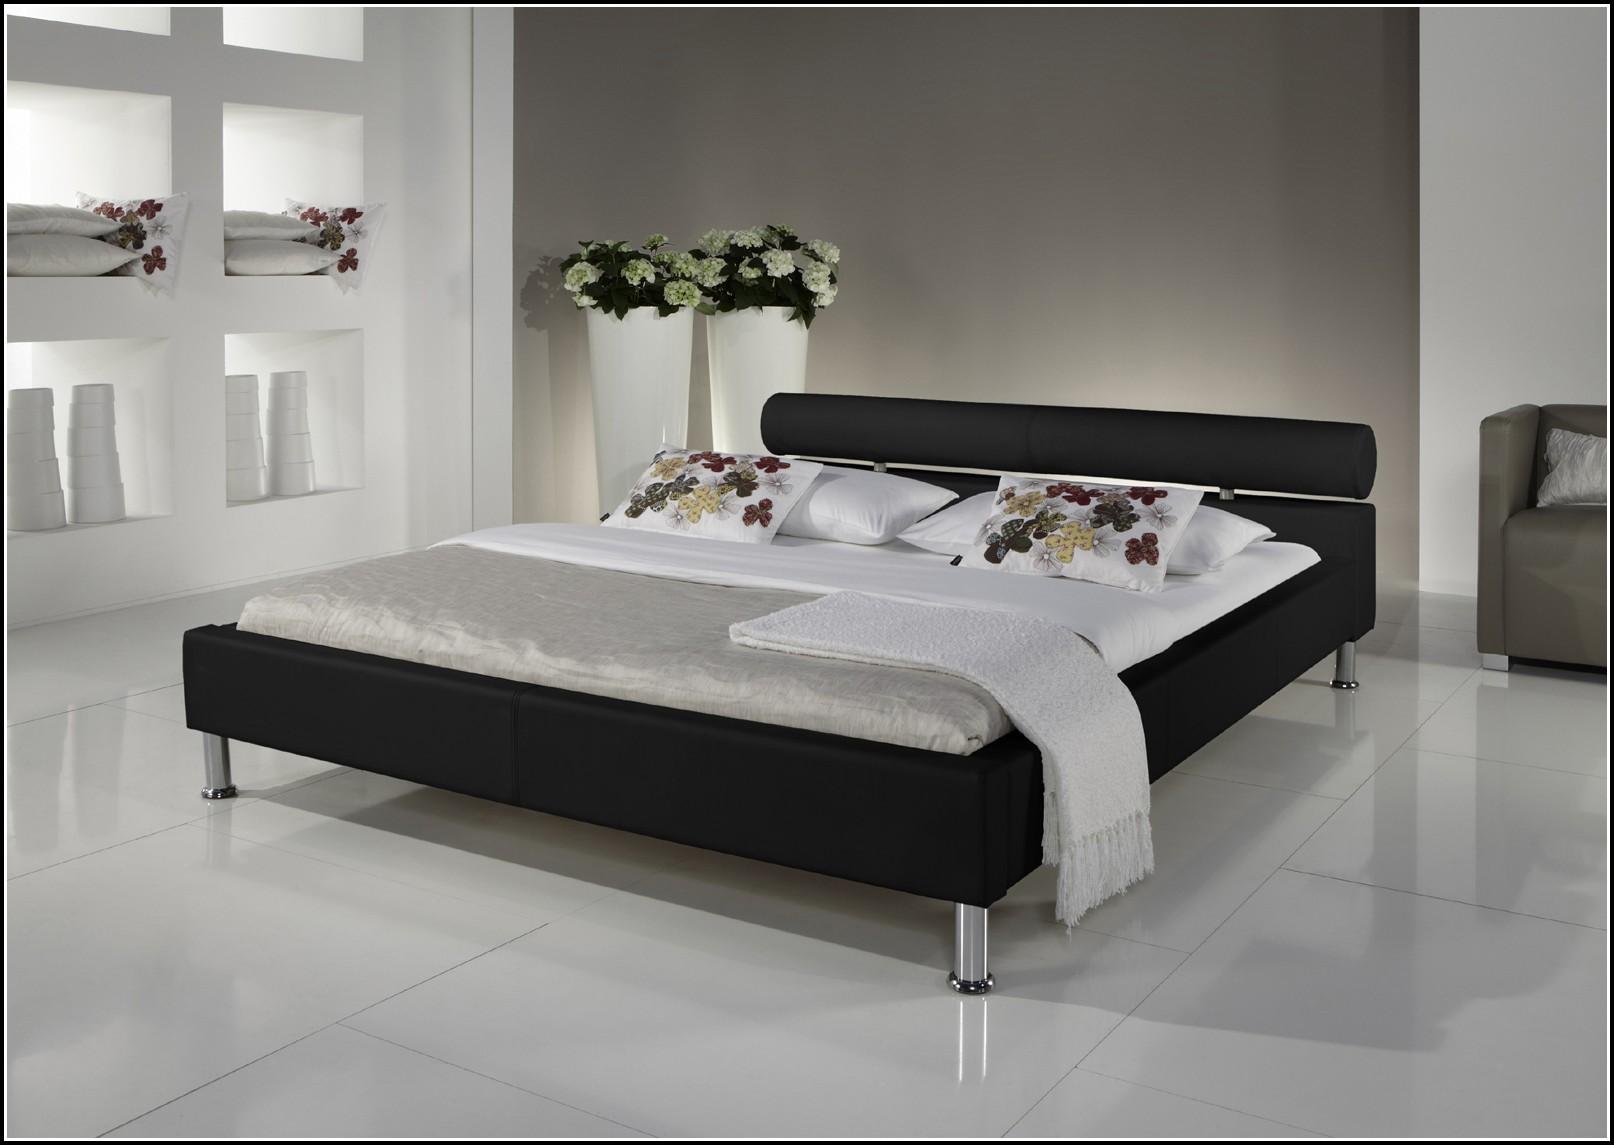 120 Cm Bett 2 Personen